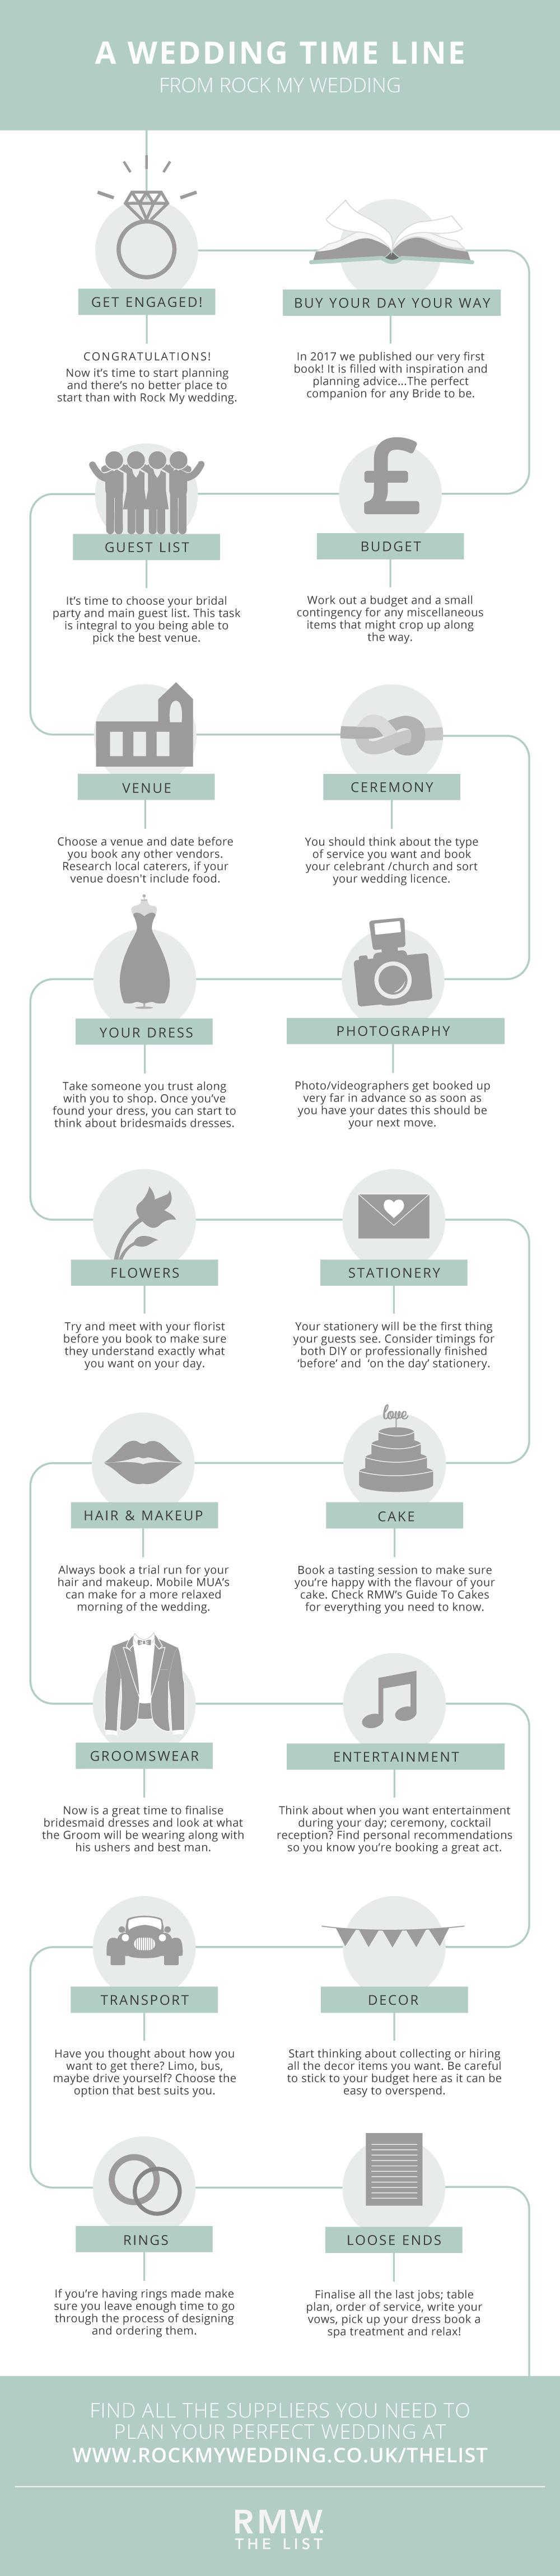 Wedding Planning Timeline From Rock My Wedding